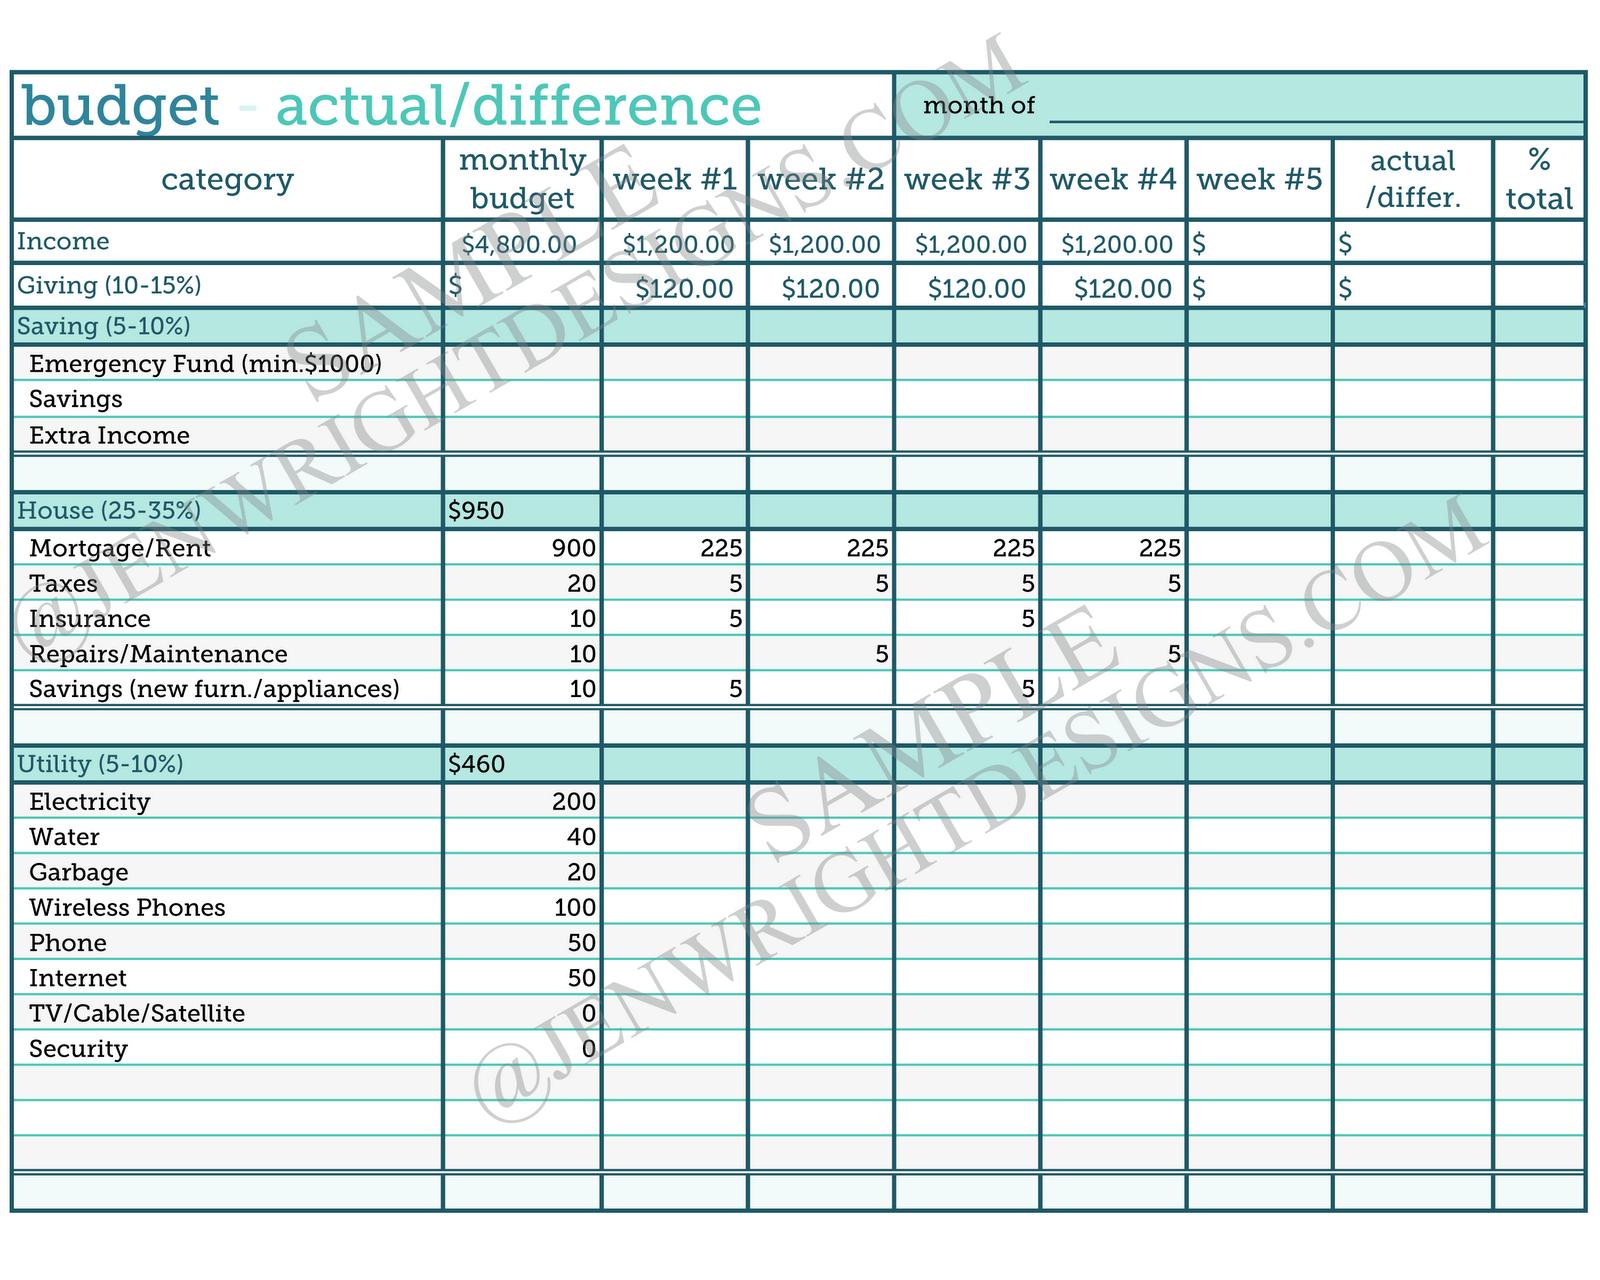 Nursing Home Budget Spreadsheet